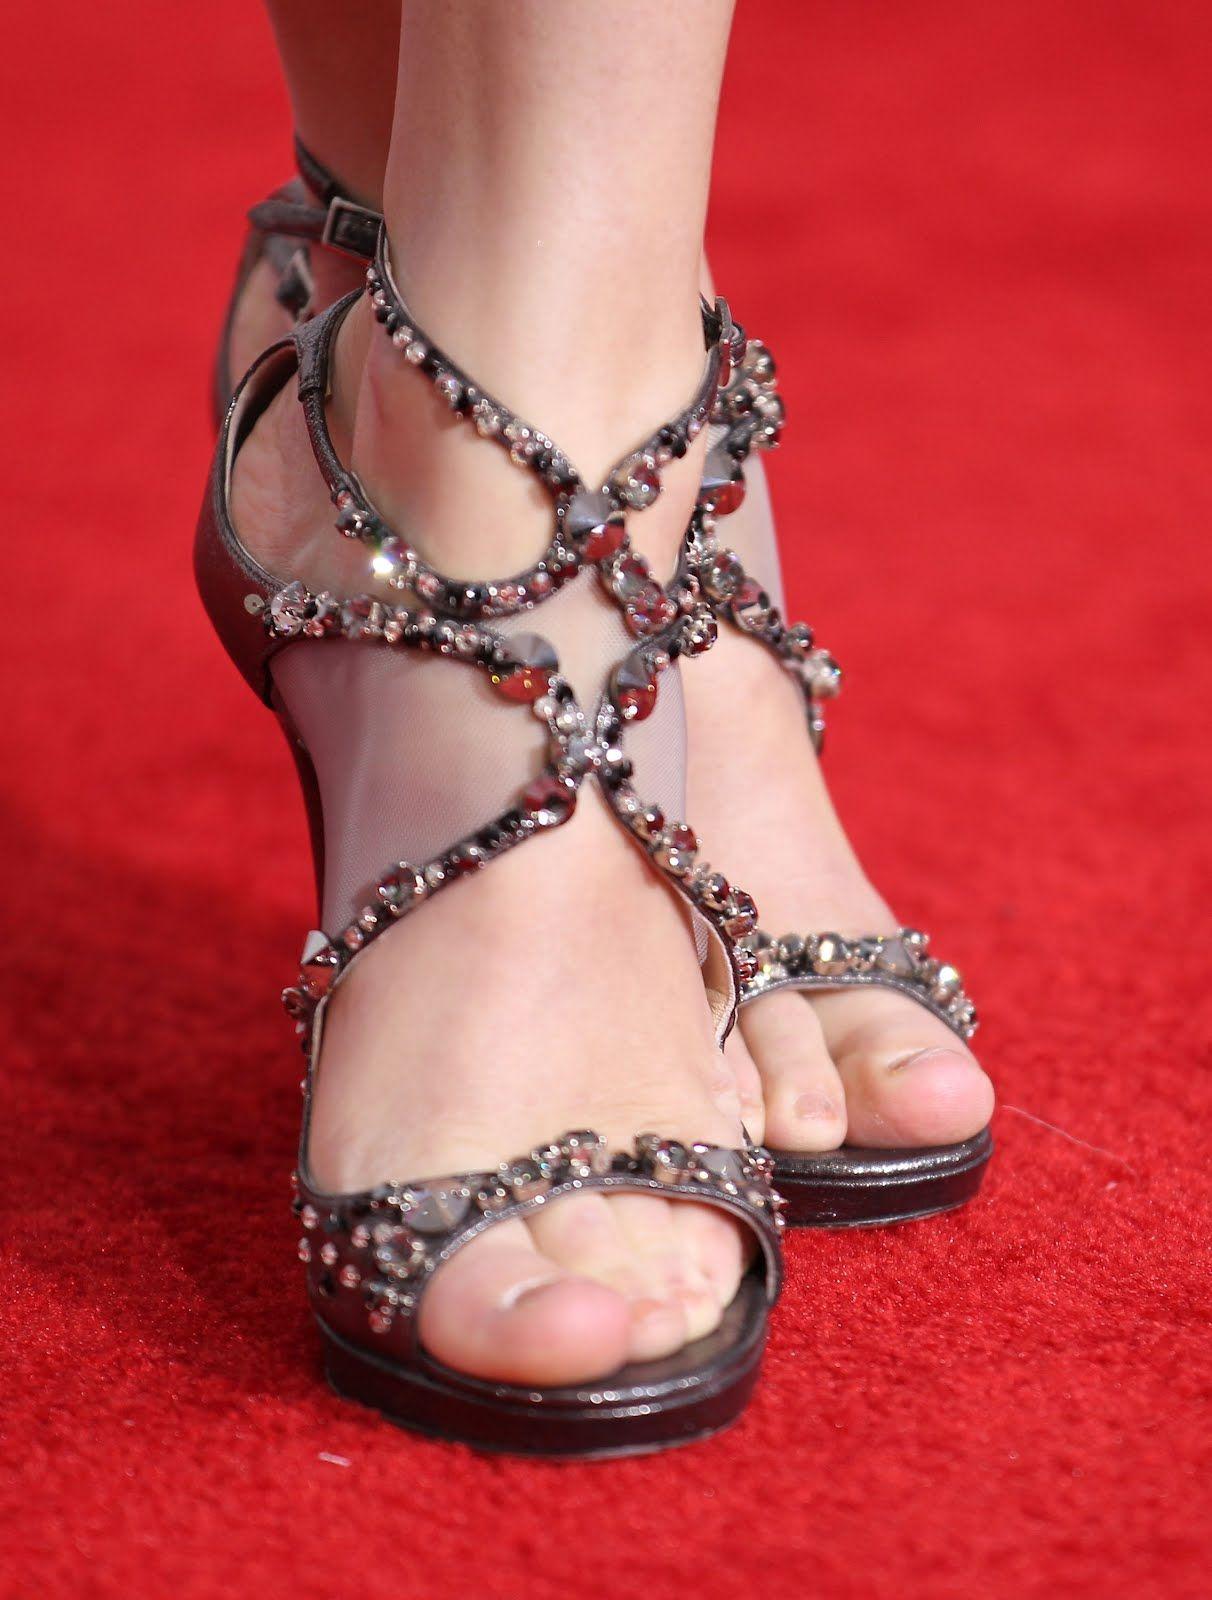 a391d9ba017 Taylor Swift Feet Jeweled Sandals